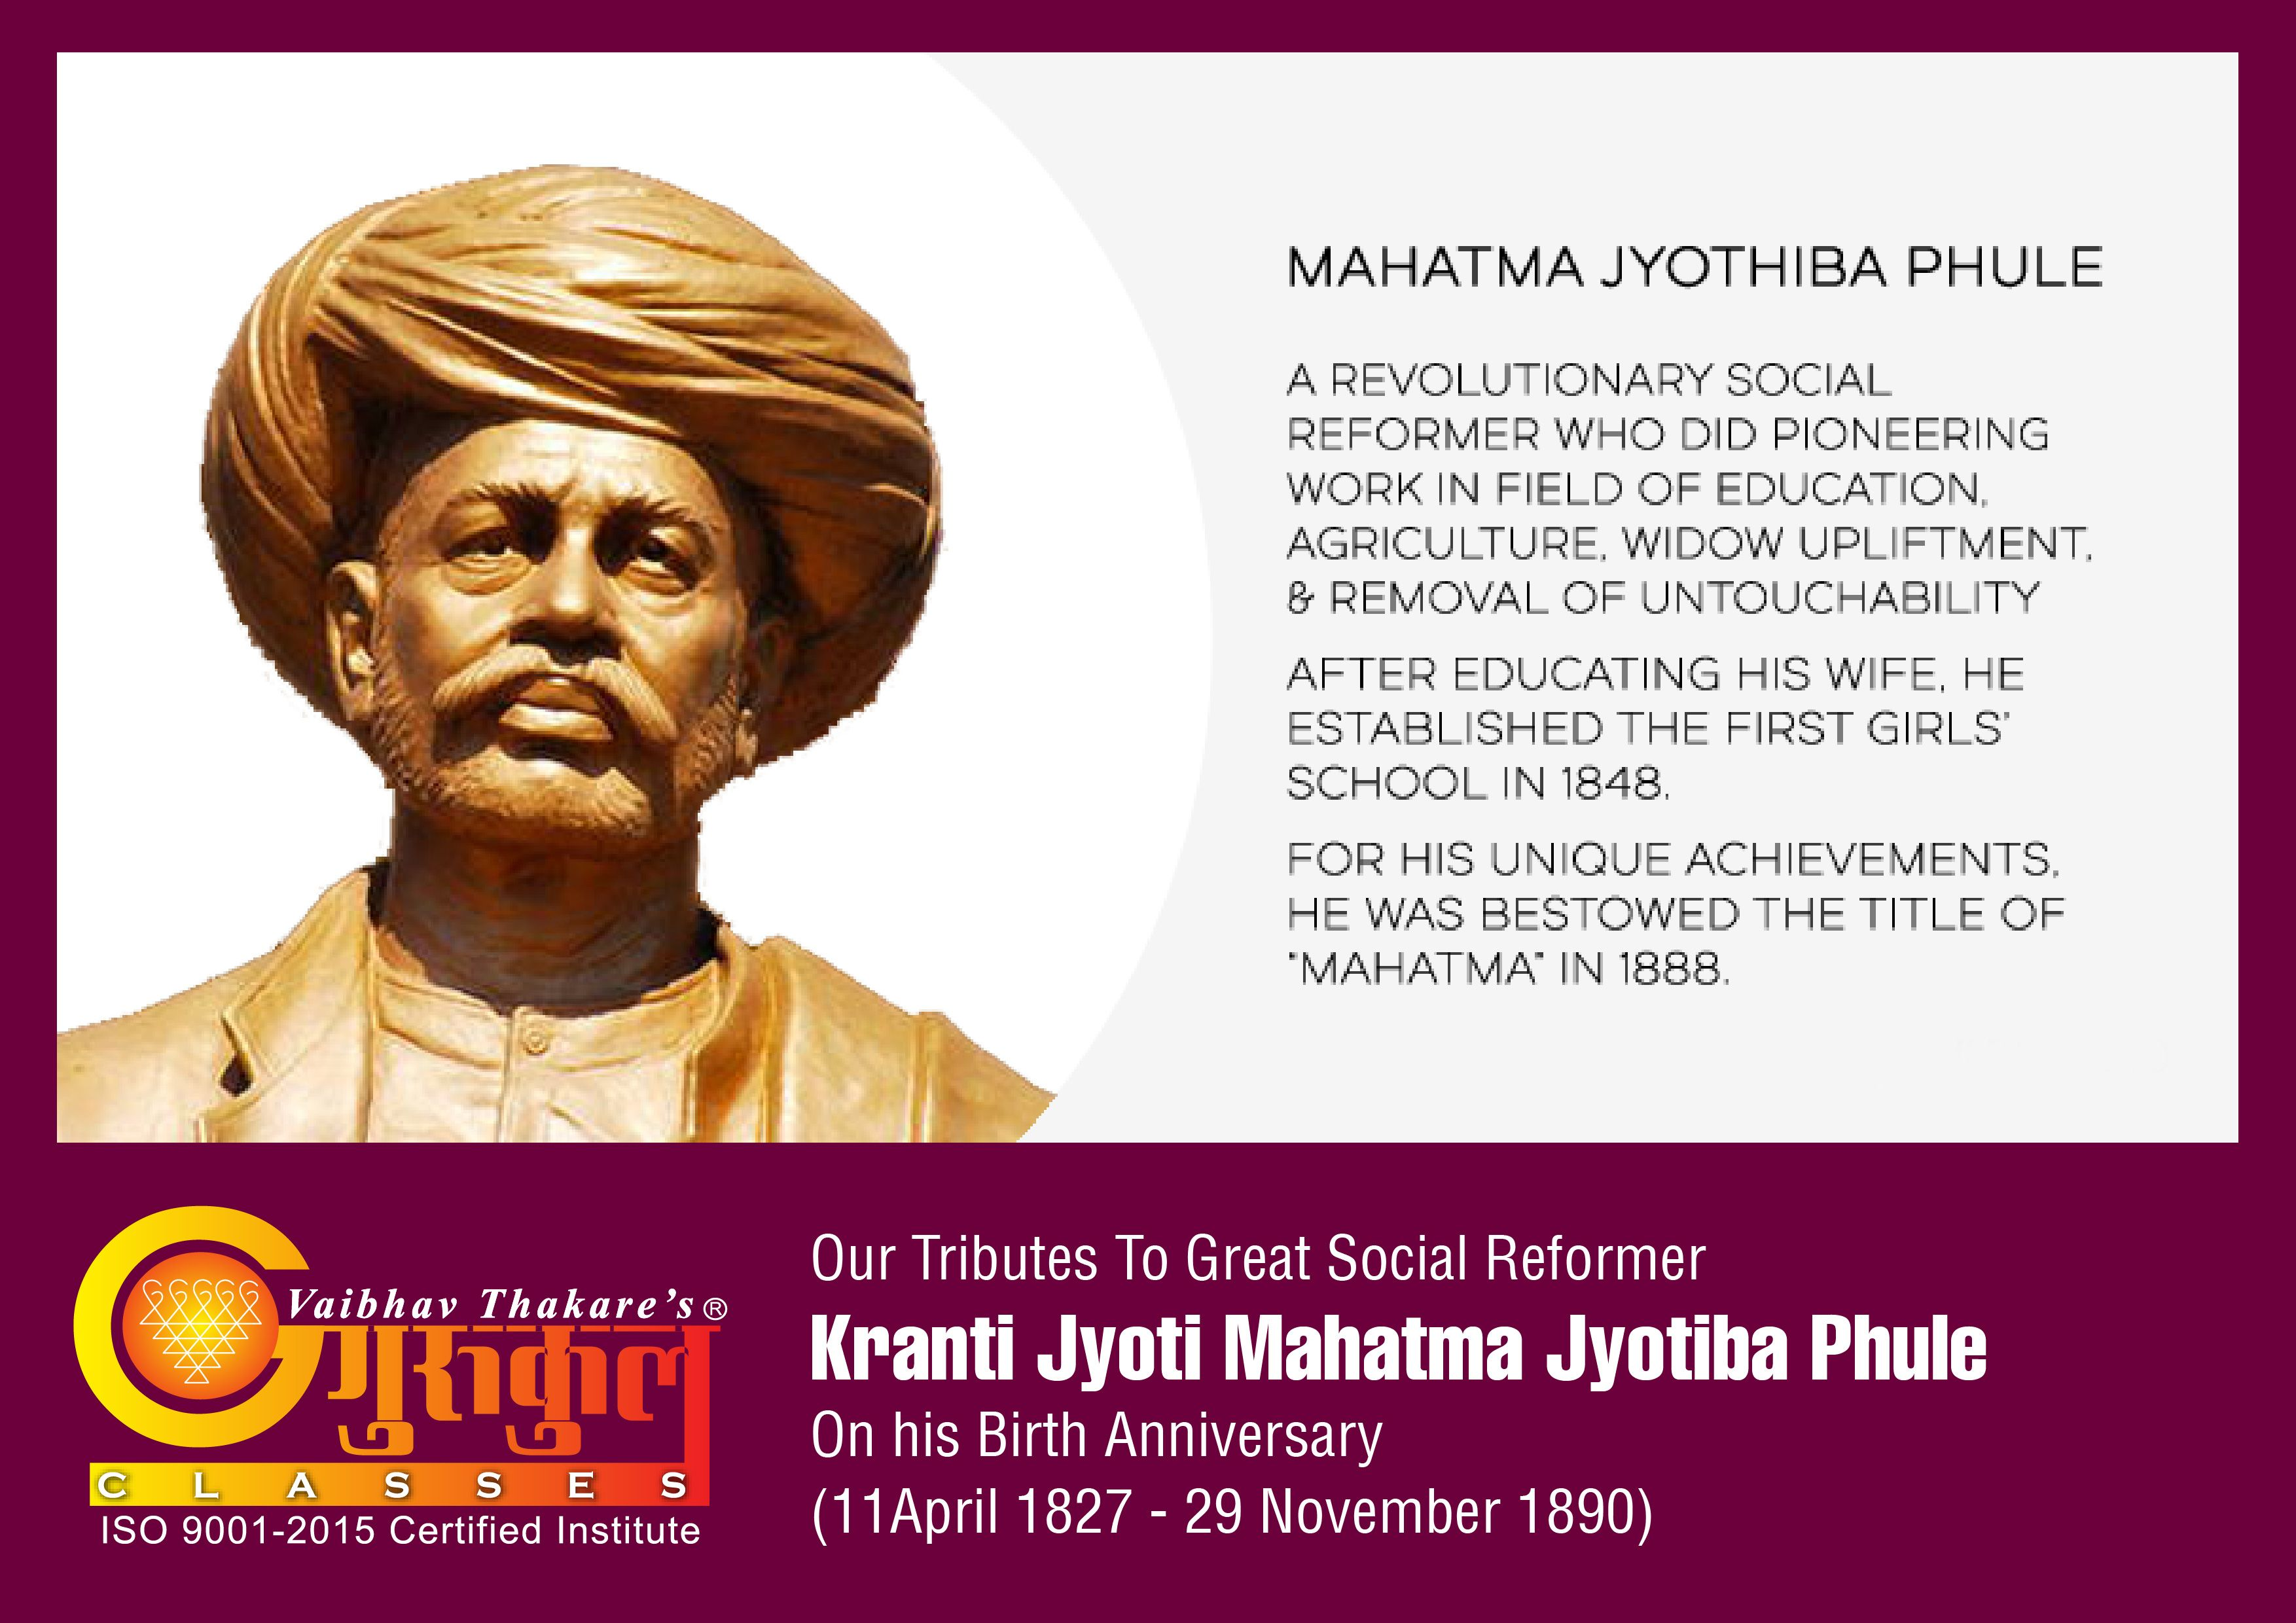 Gurukulscienceclasses Our Tributes To Great Social Reformer Kranti Jyoti Mahatma Jyotiba Phule On His Birth Anniversary 1 Revolutionaries Reformers Education